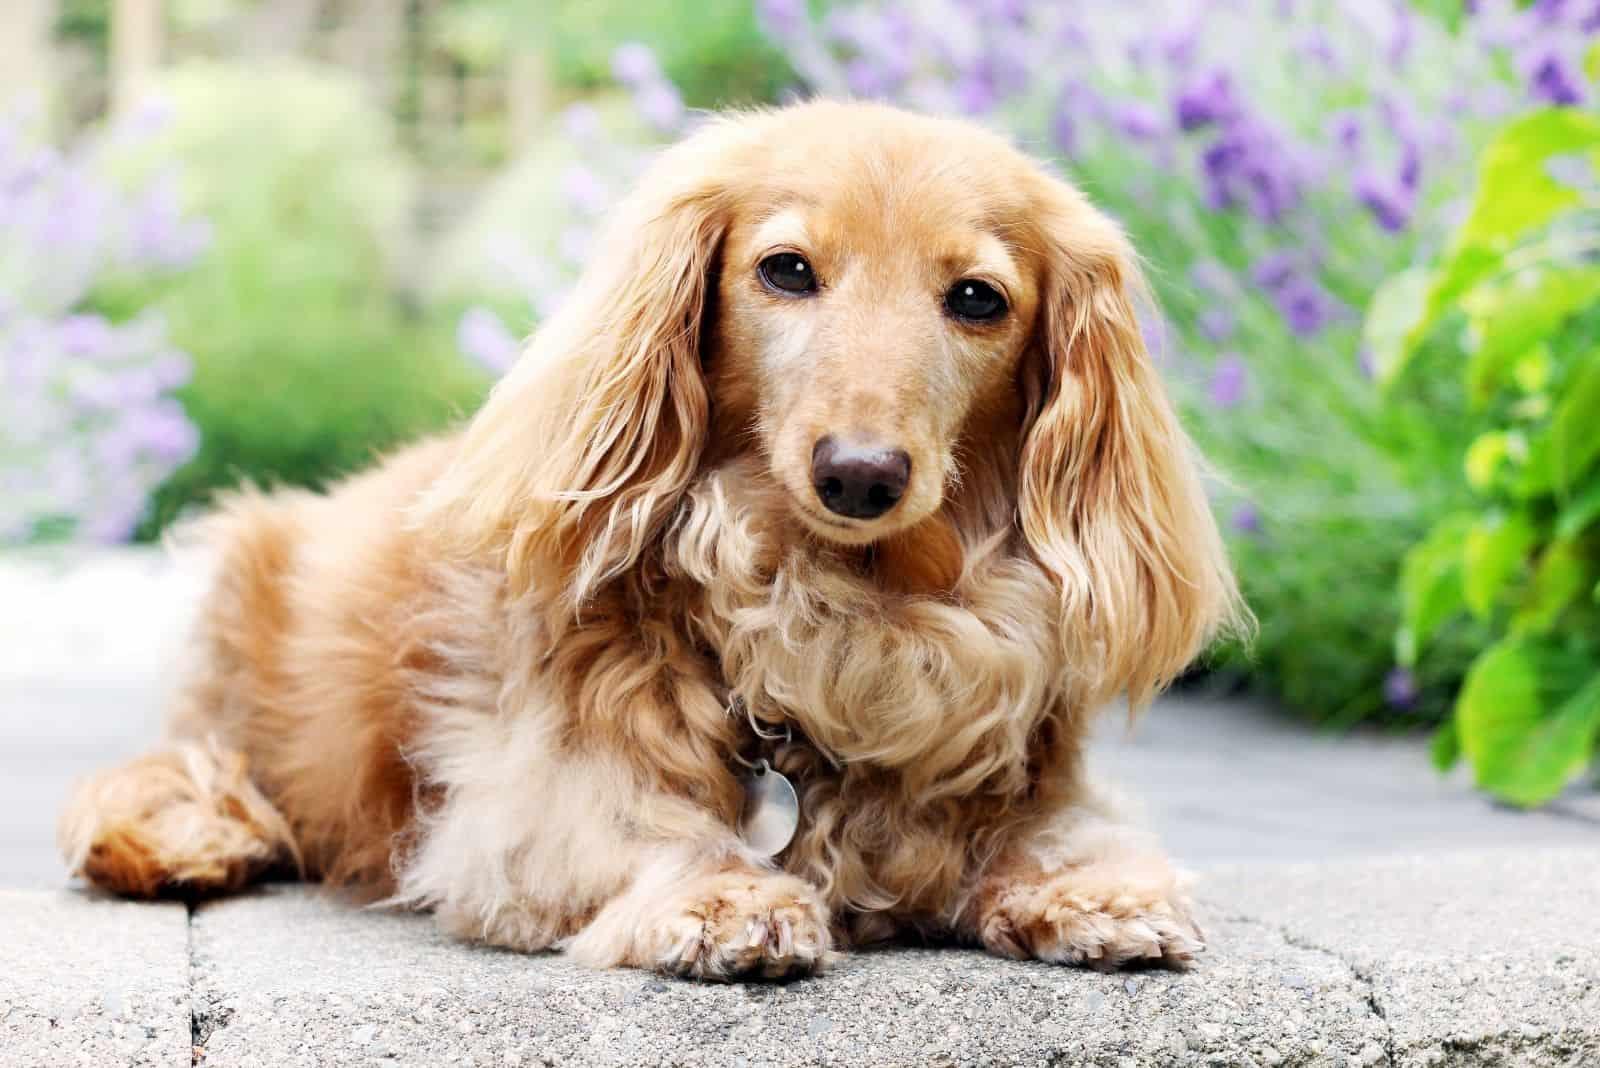 purebred longhair dog